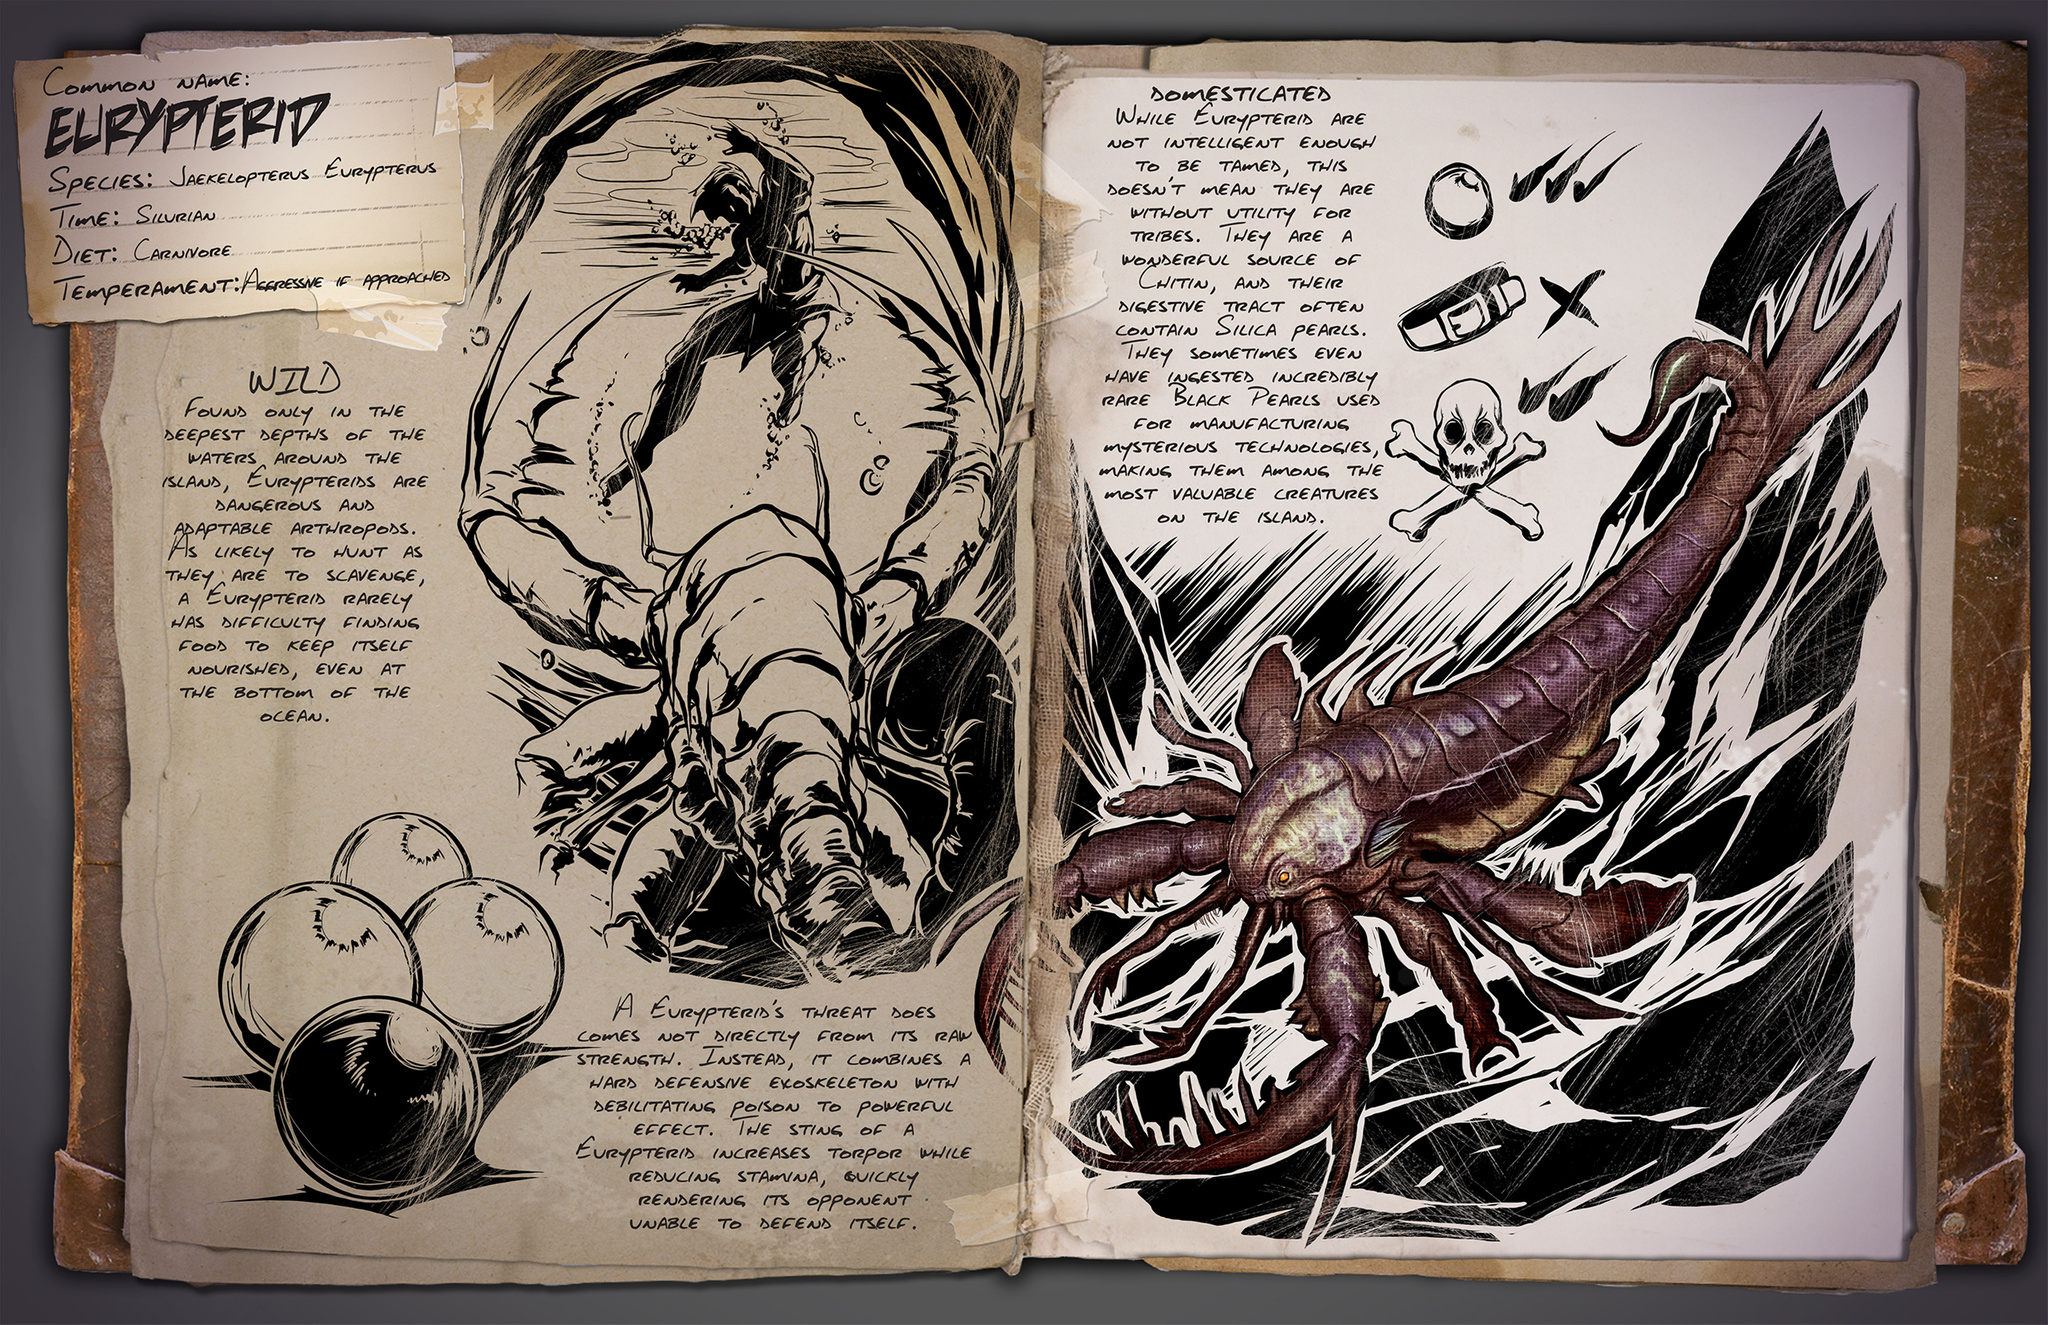 Dino Dossier: Eurypterid